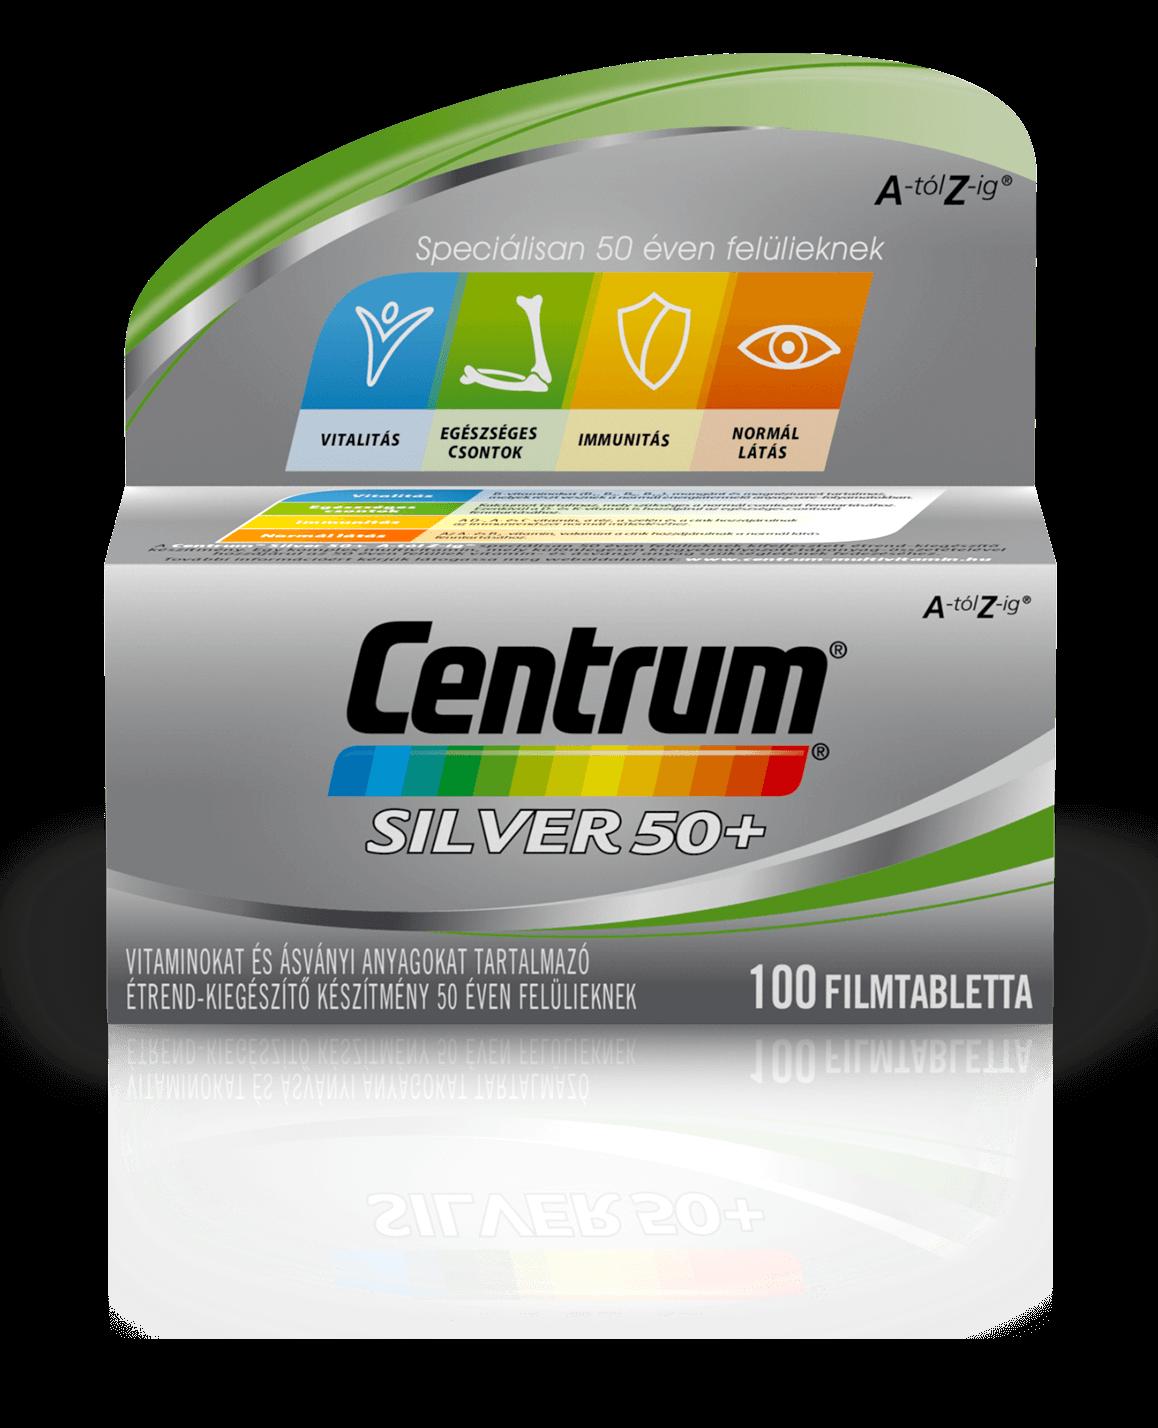 Centrum Centrum Silver 50+ A-tól Z-ig 100 tab.